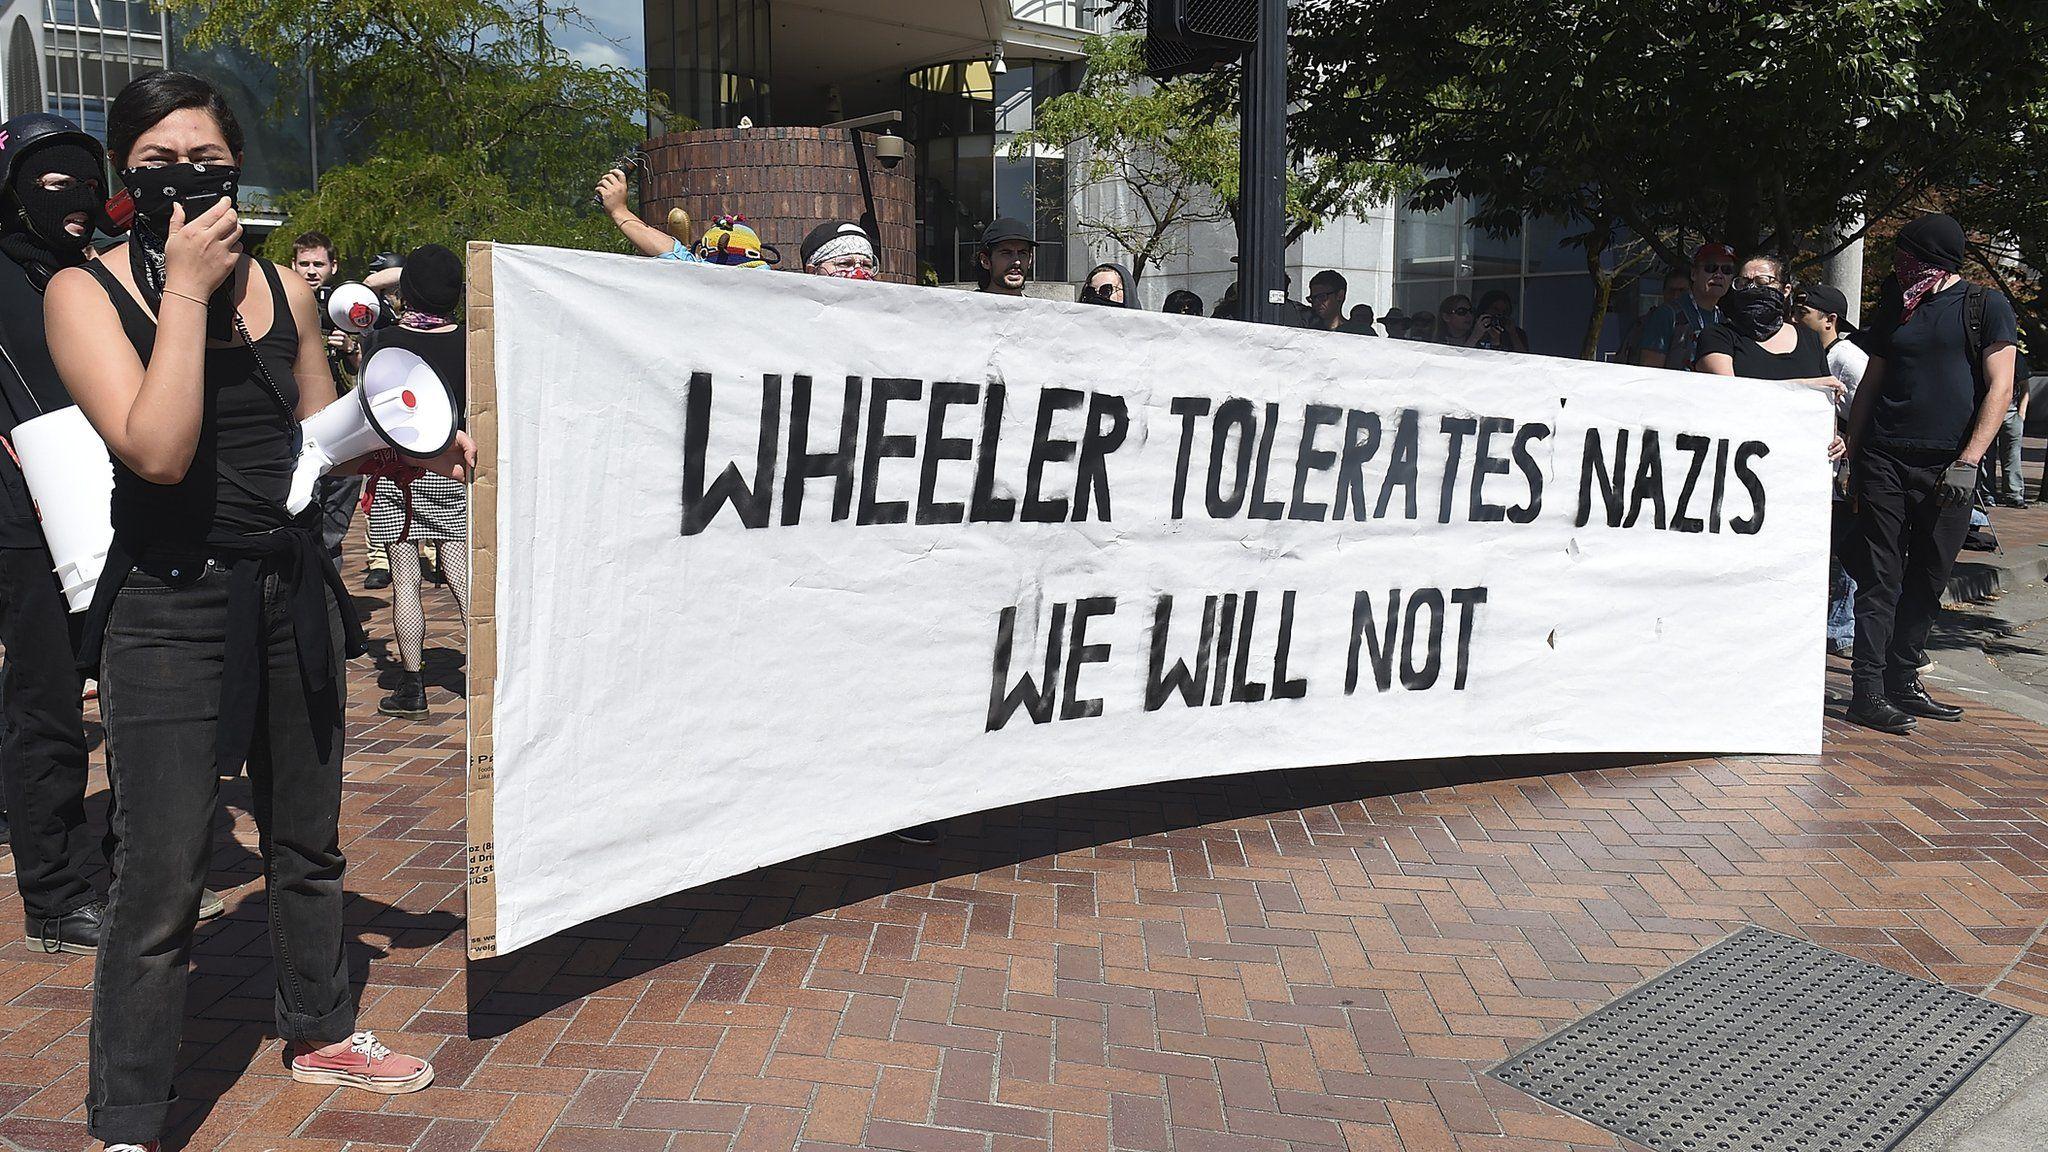 banner: wheeler tolerates Nazis, we will not